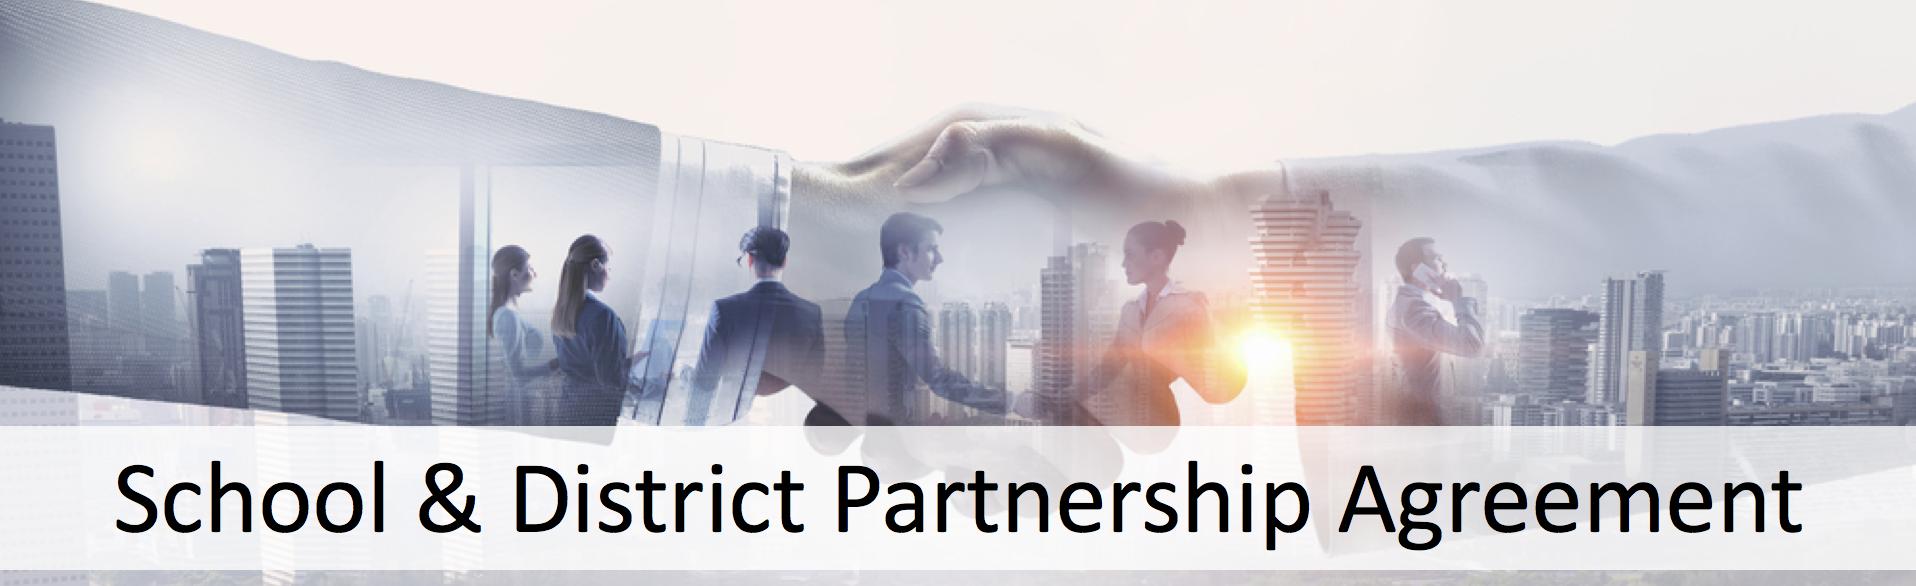 partnership agreement banner